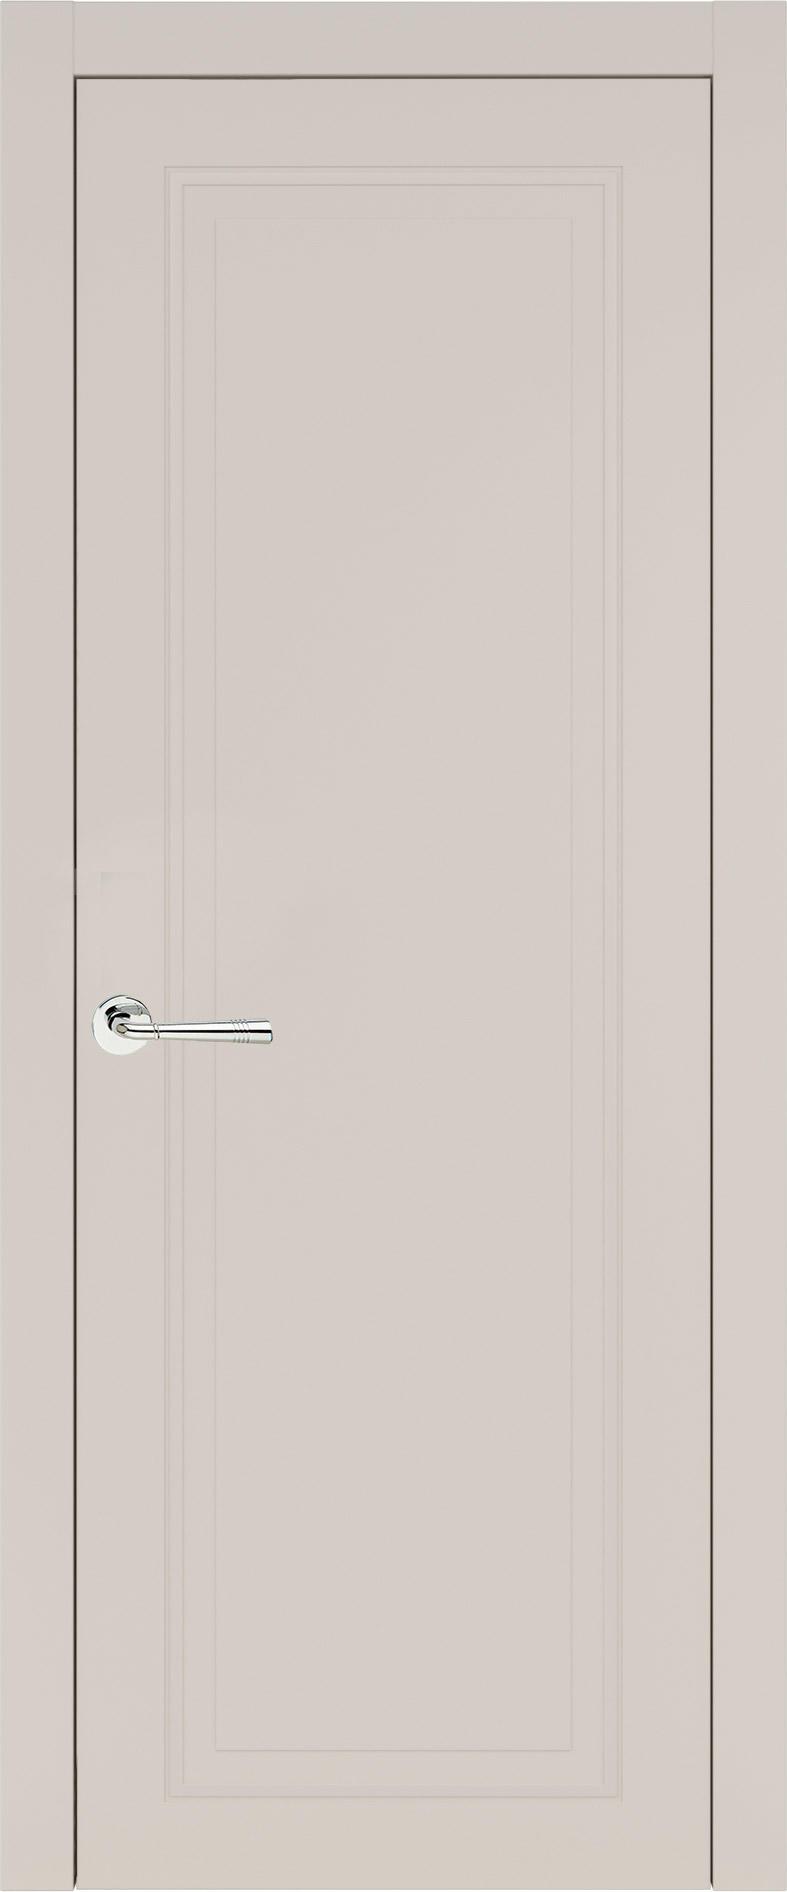 Domenica Neo Classic цвет - Жемчужная эмаль (RAL 1013) Без стекла (ДГ)